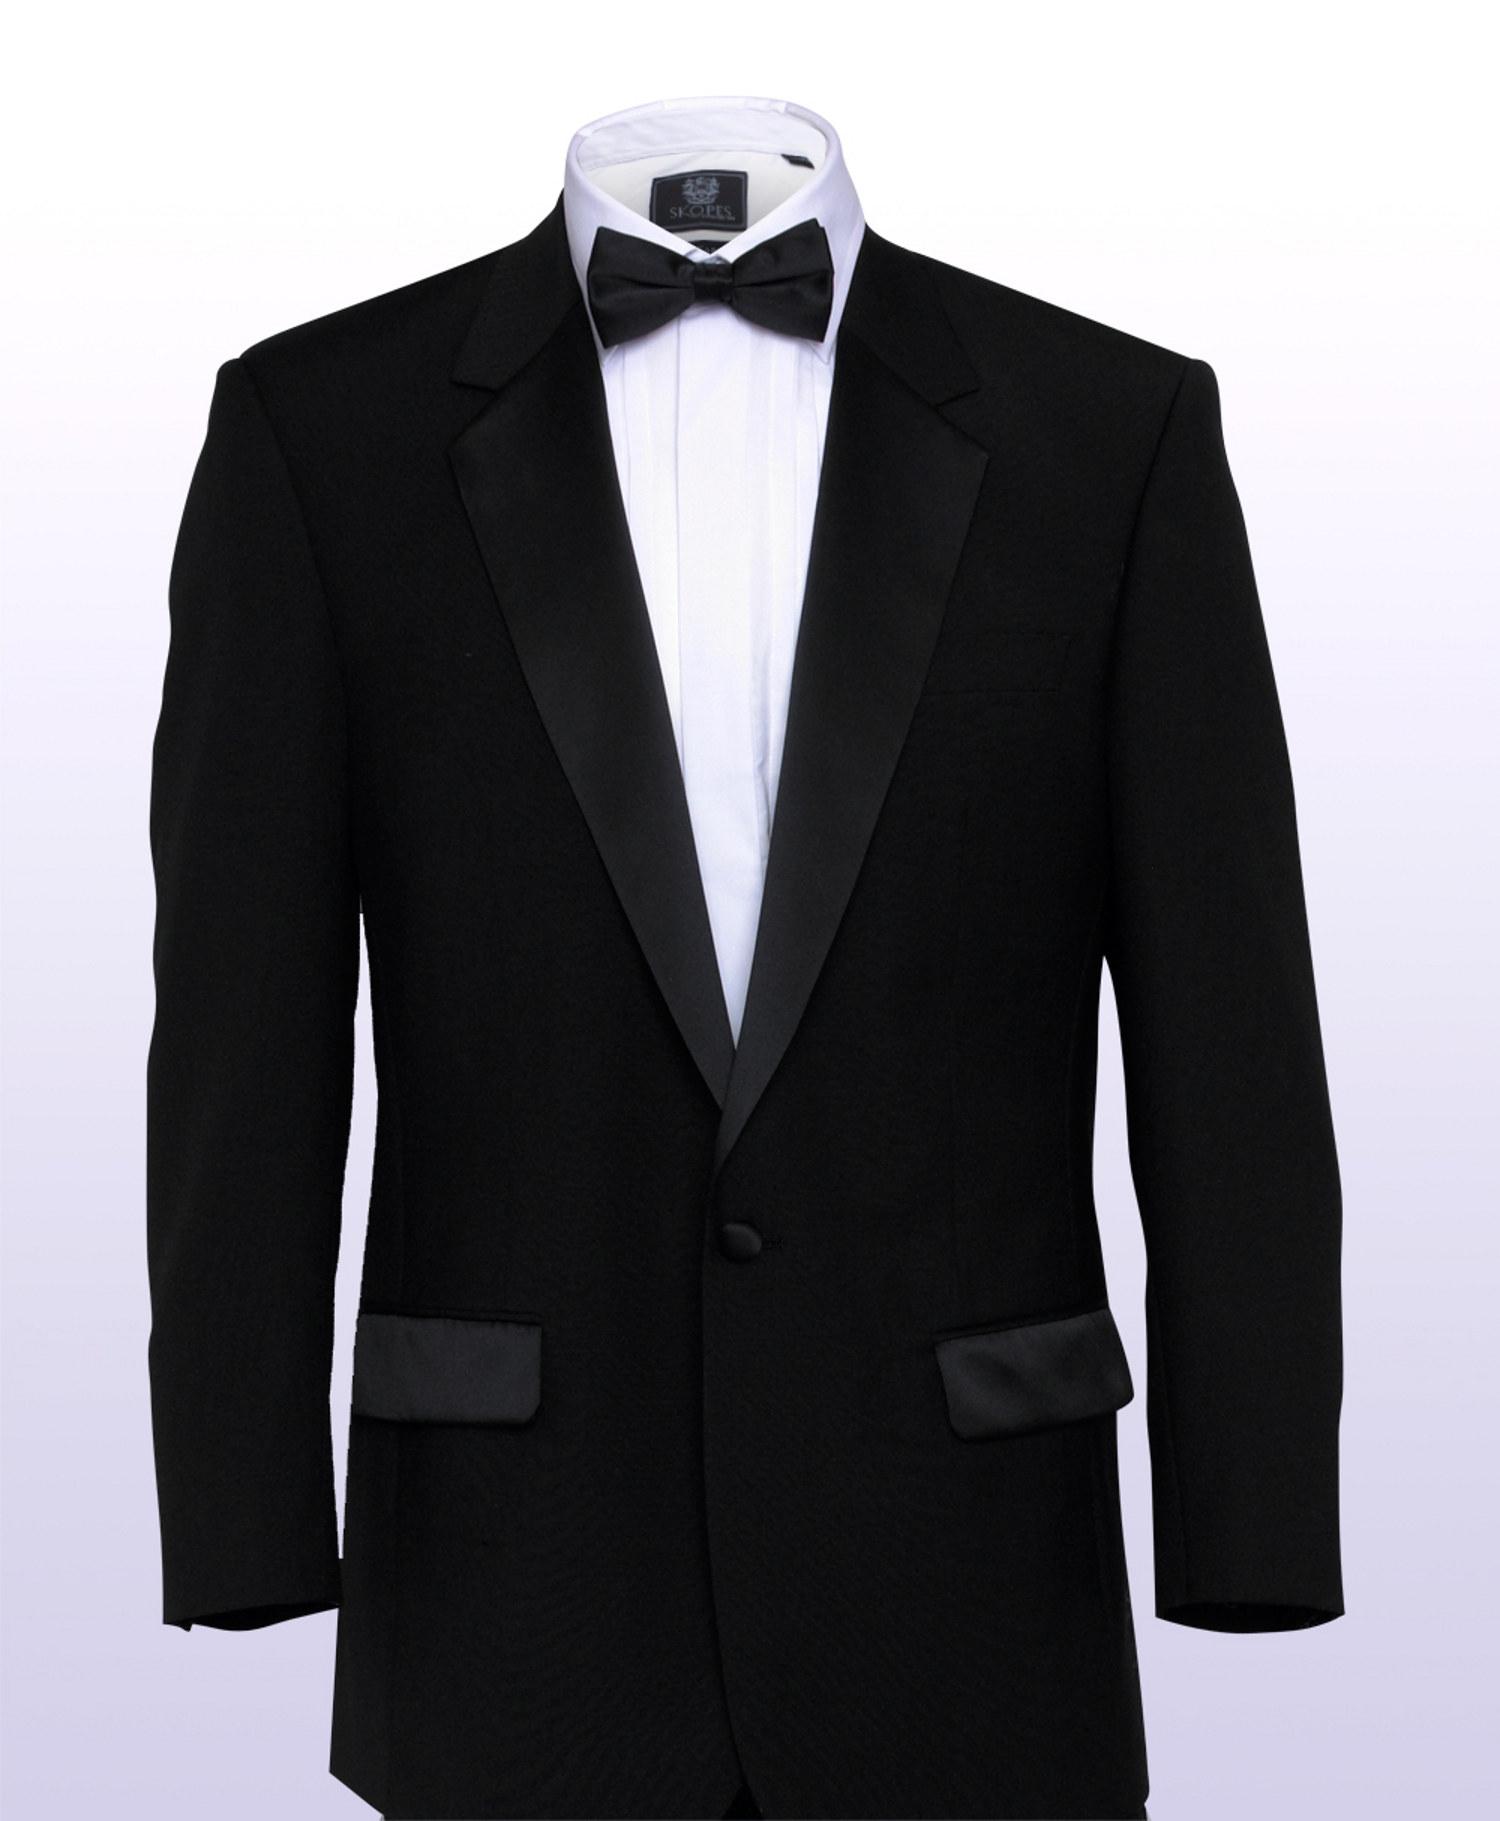 Chatsworth Tuxedo